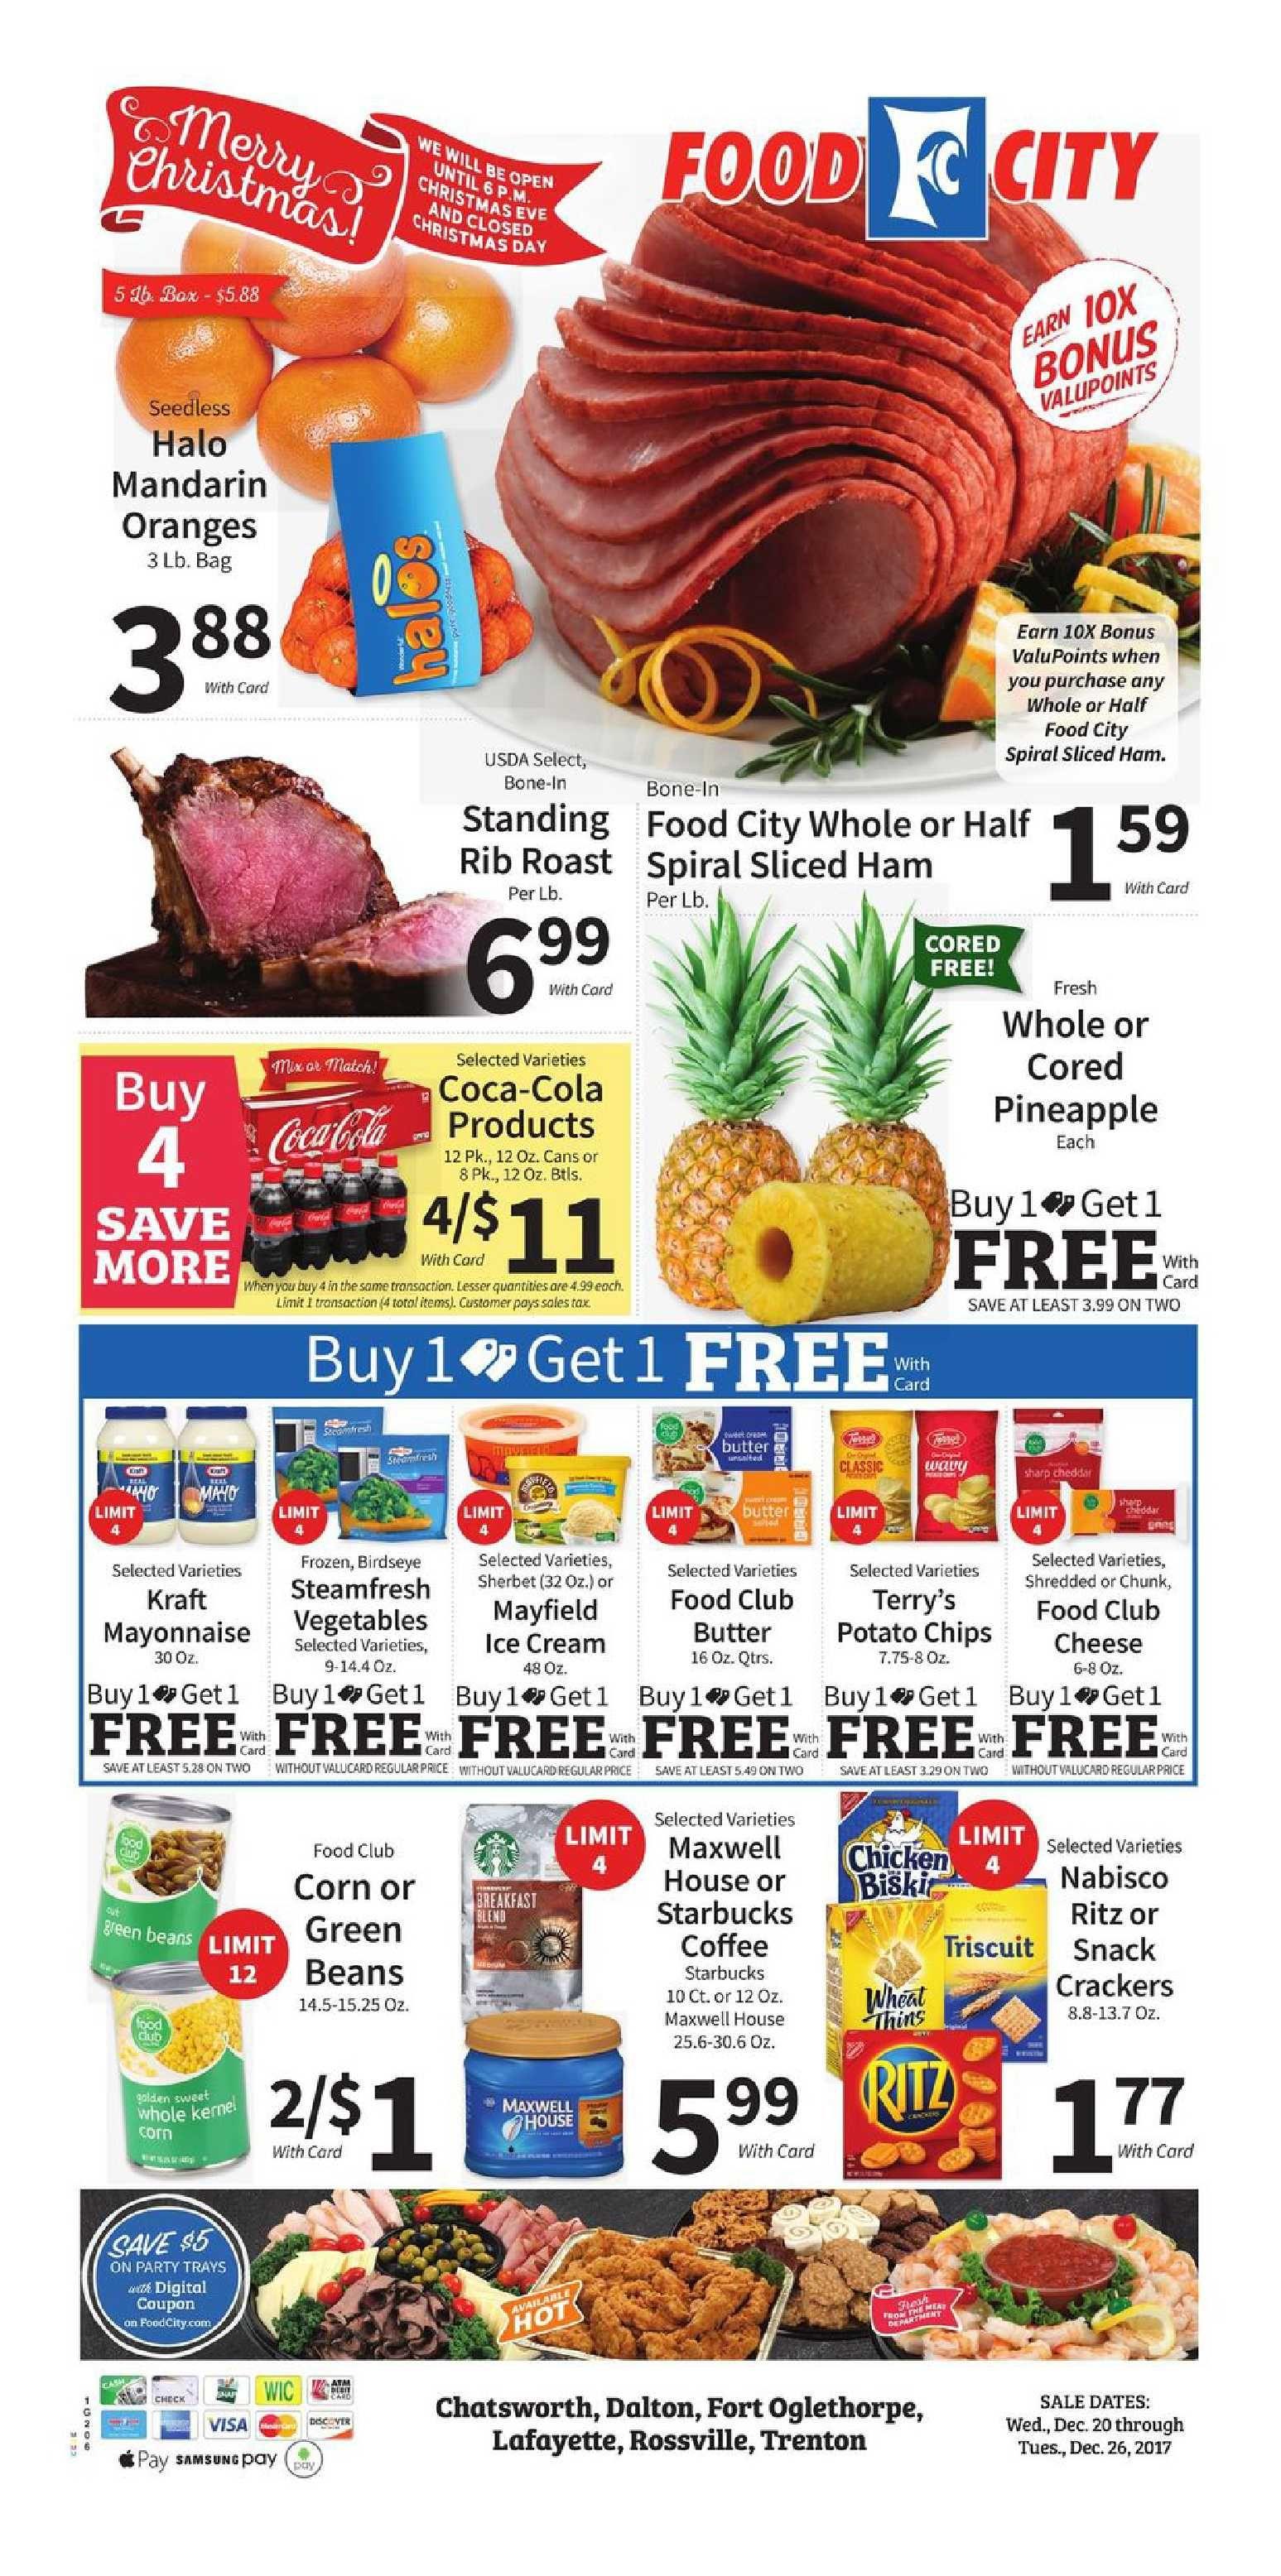 Food city weekly ad december 20 26 2017 httpwww